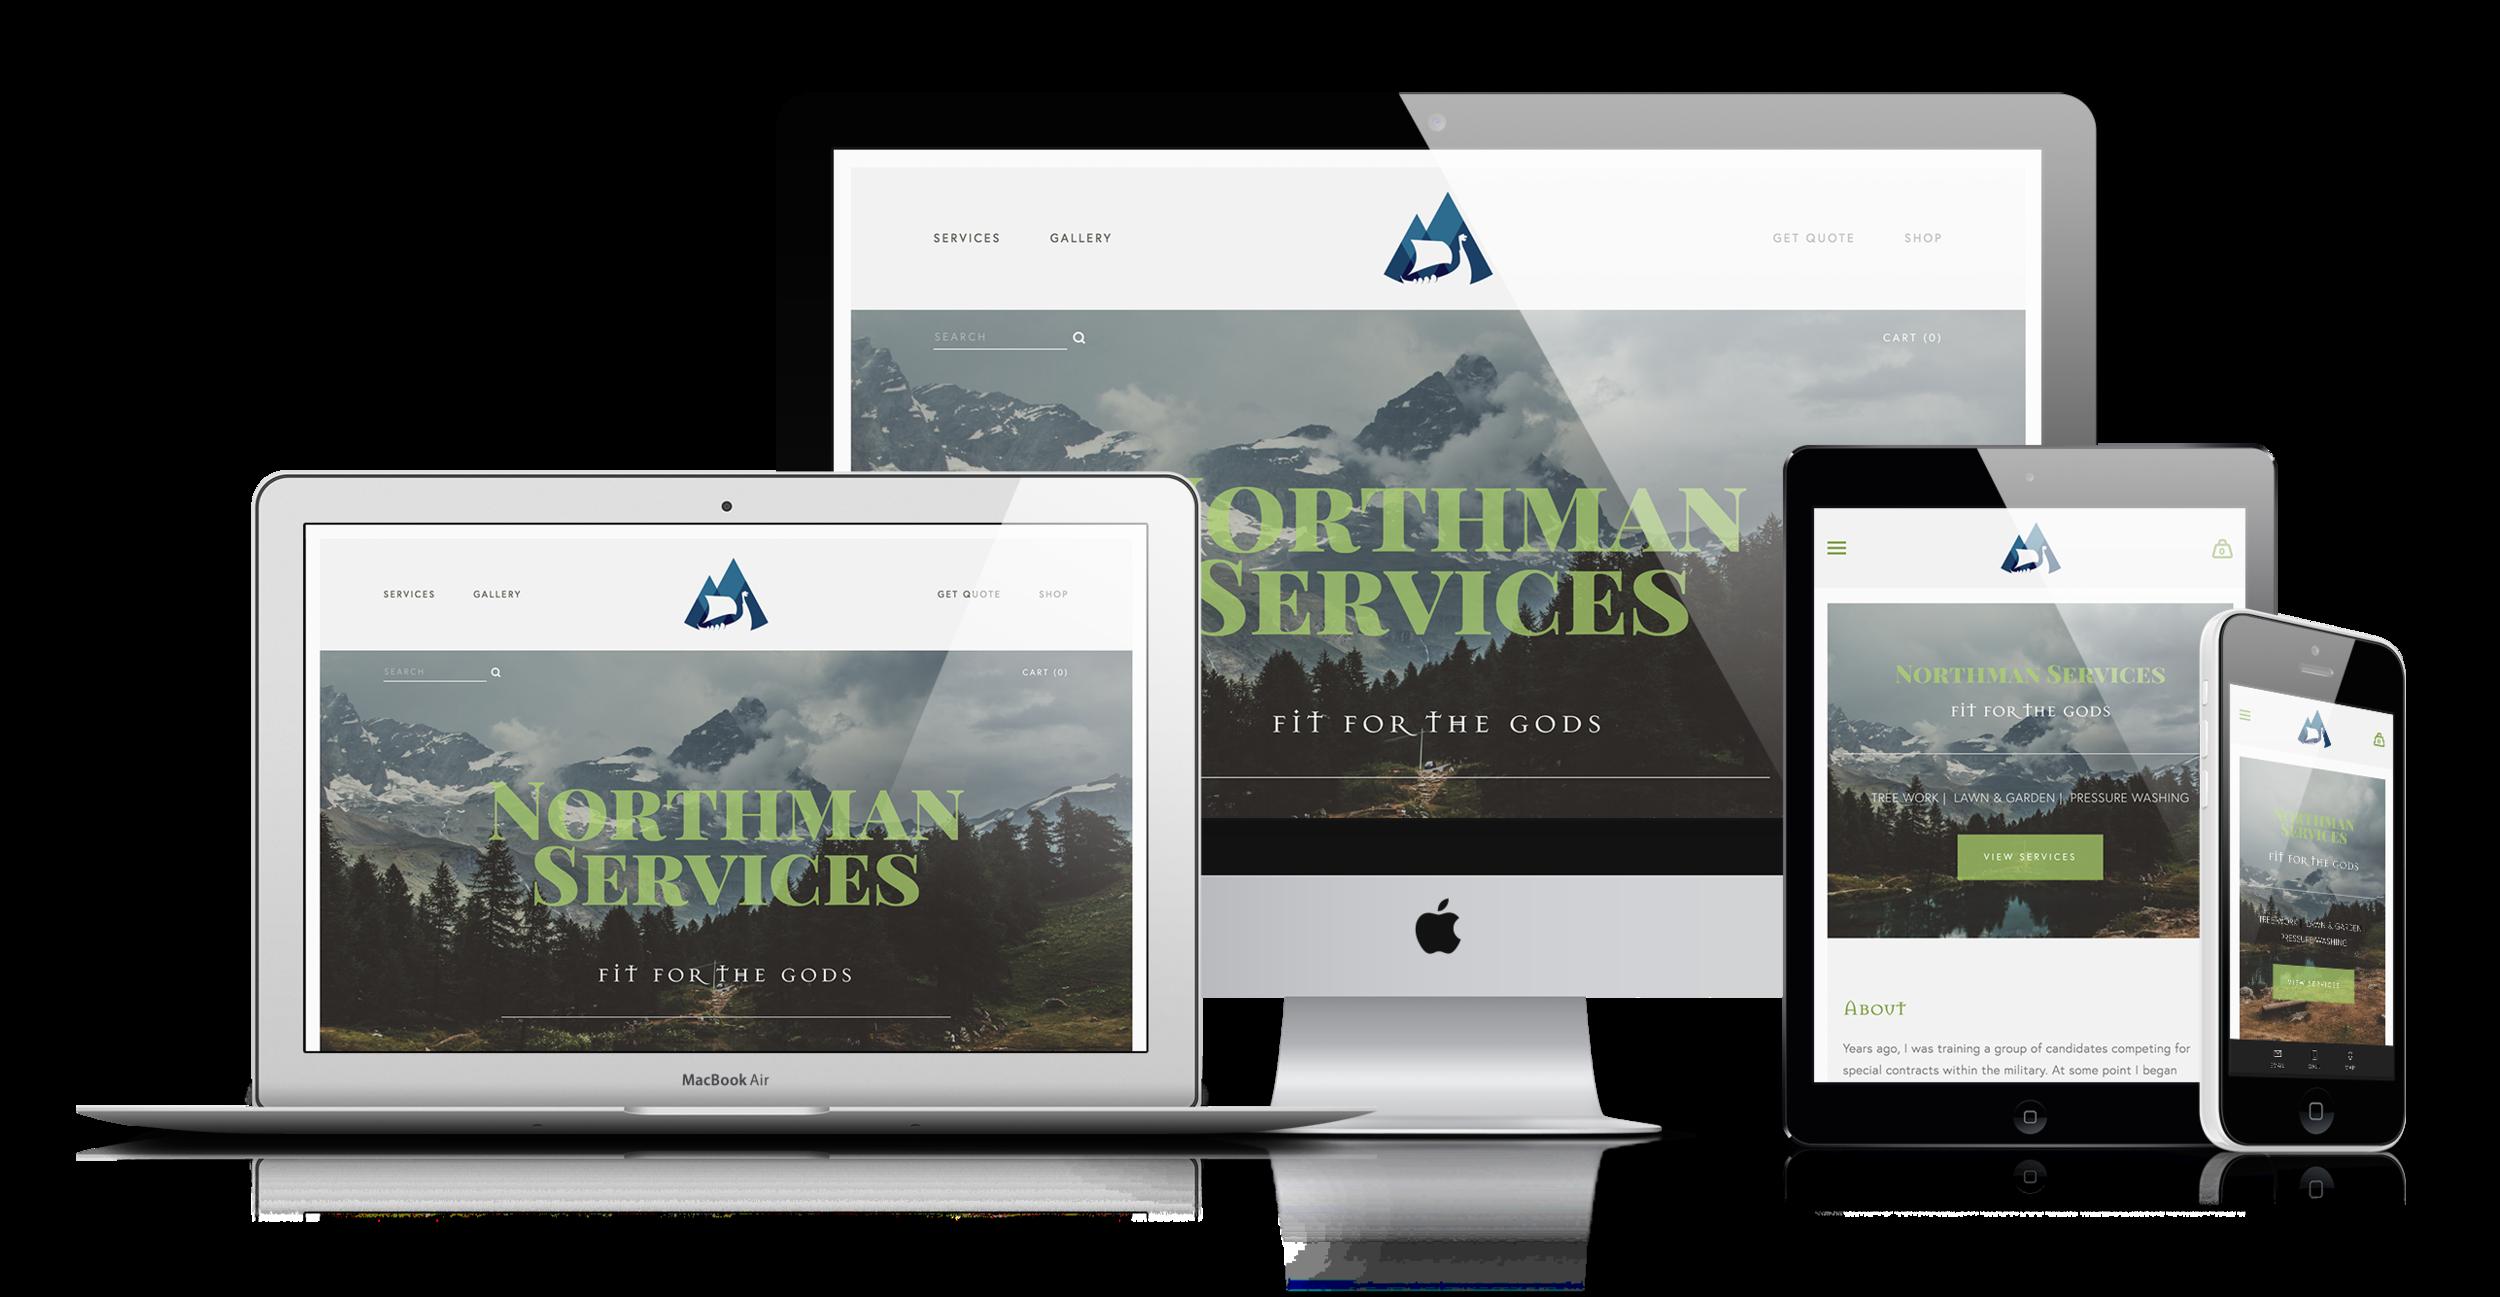 northmanserviceswebsite